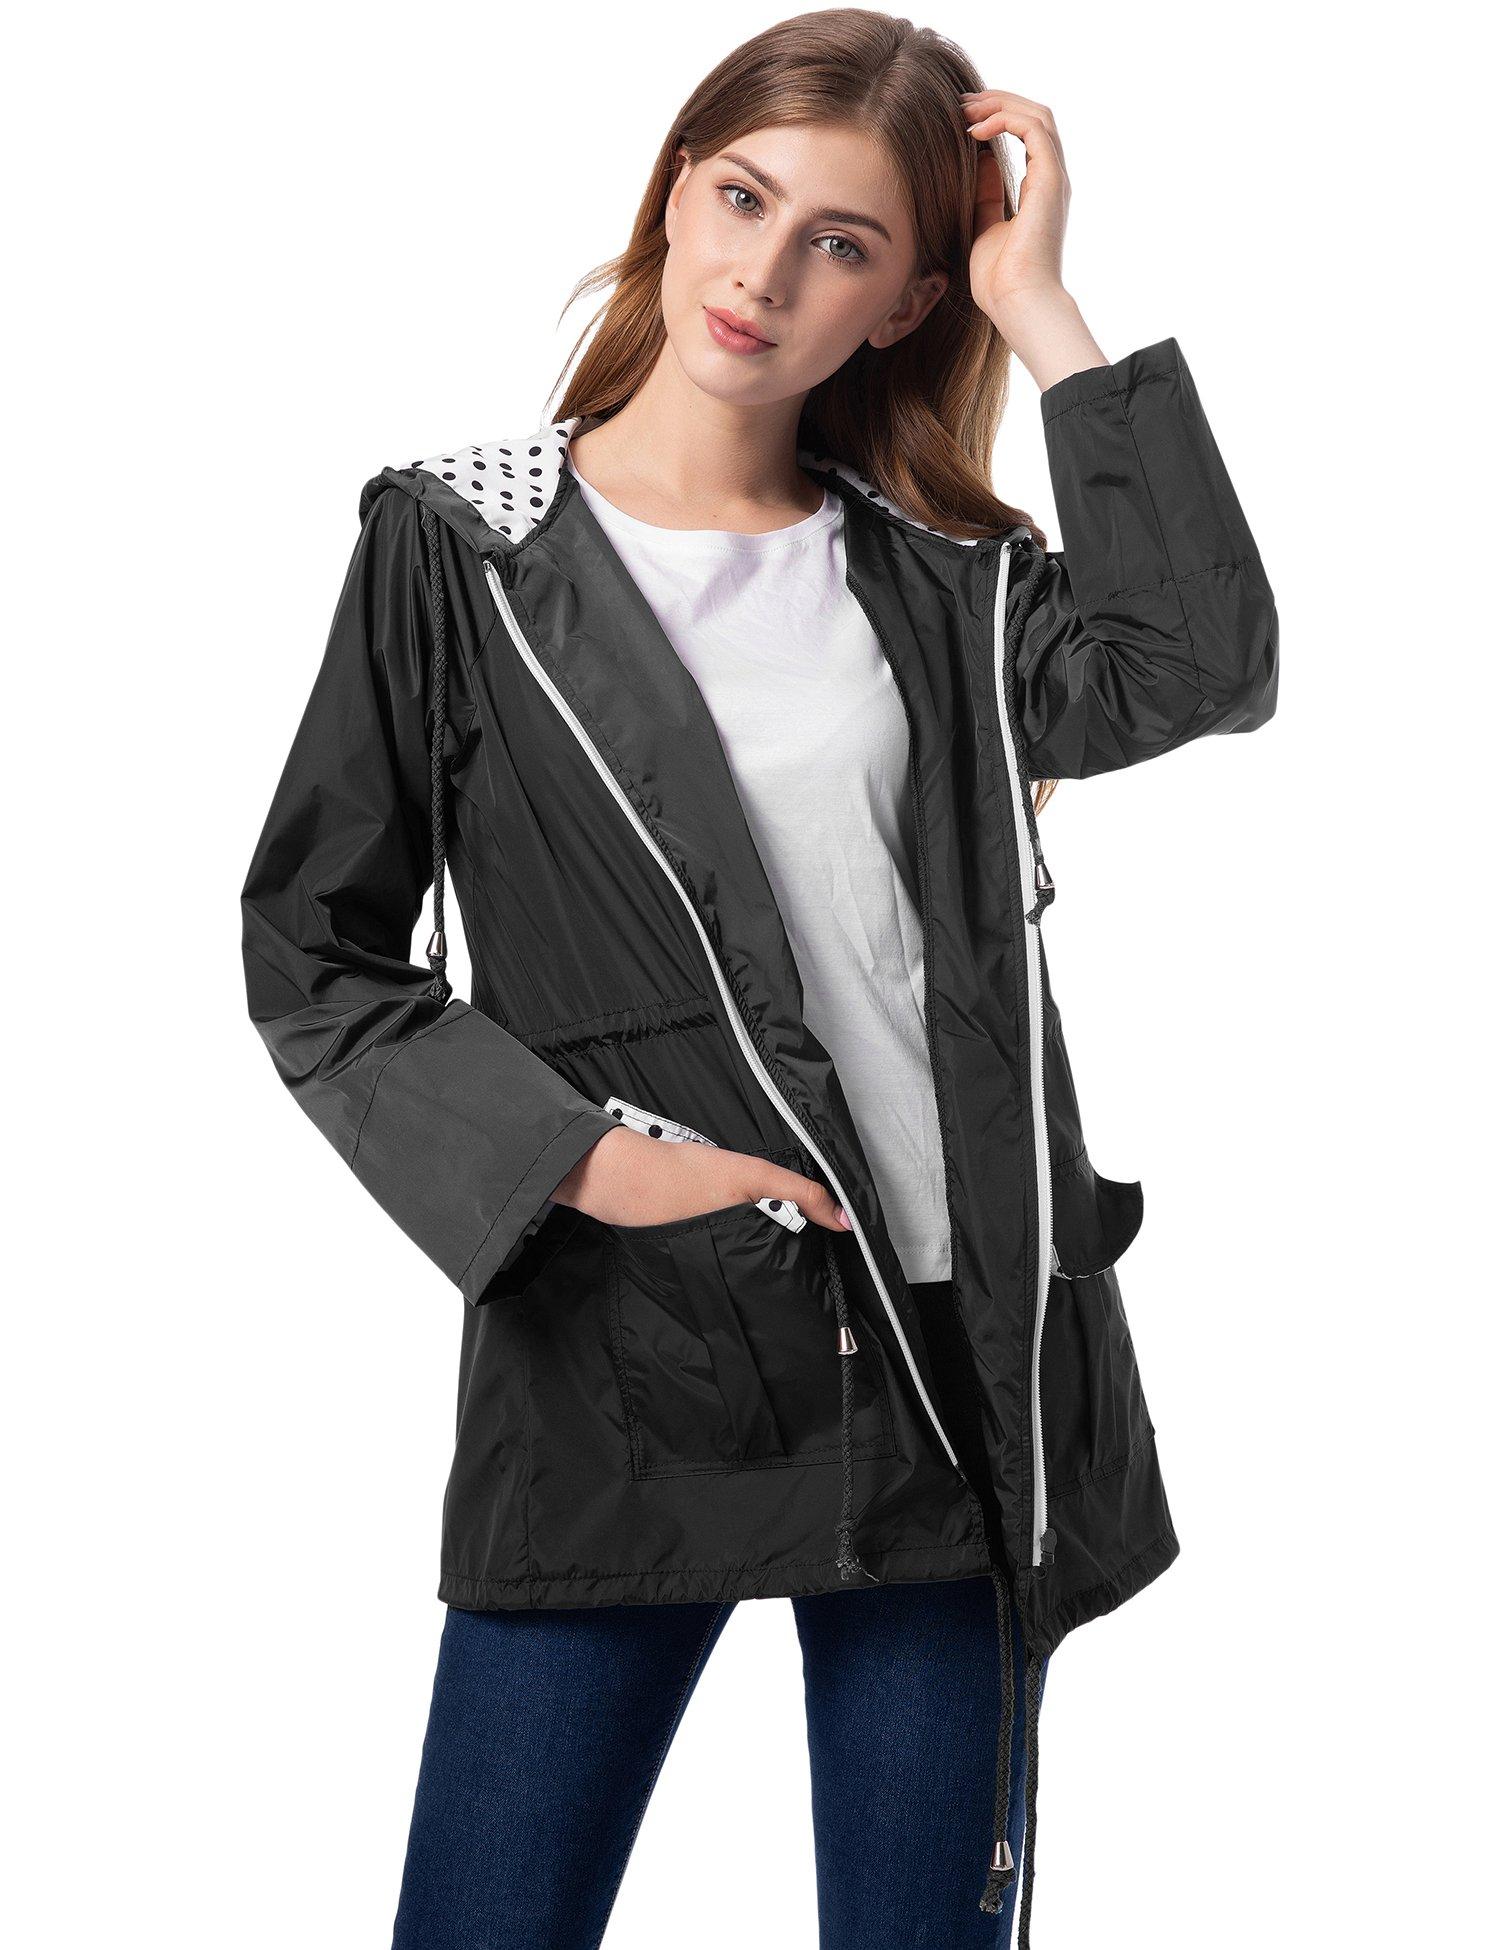 Romanstii Womens Raincoats Waterproof with Hood Outdoor Windbreaker Lightweight Rain Jacket Black M